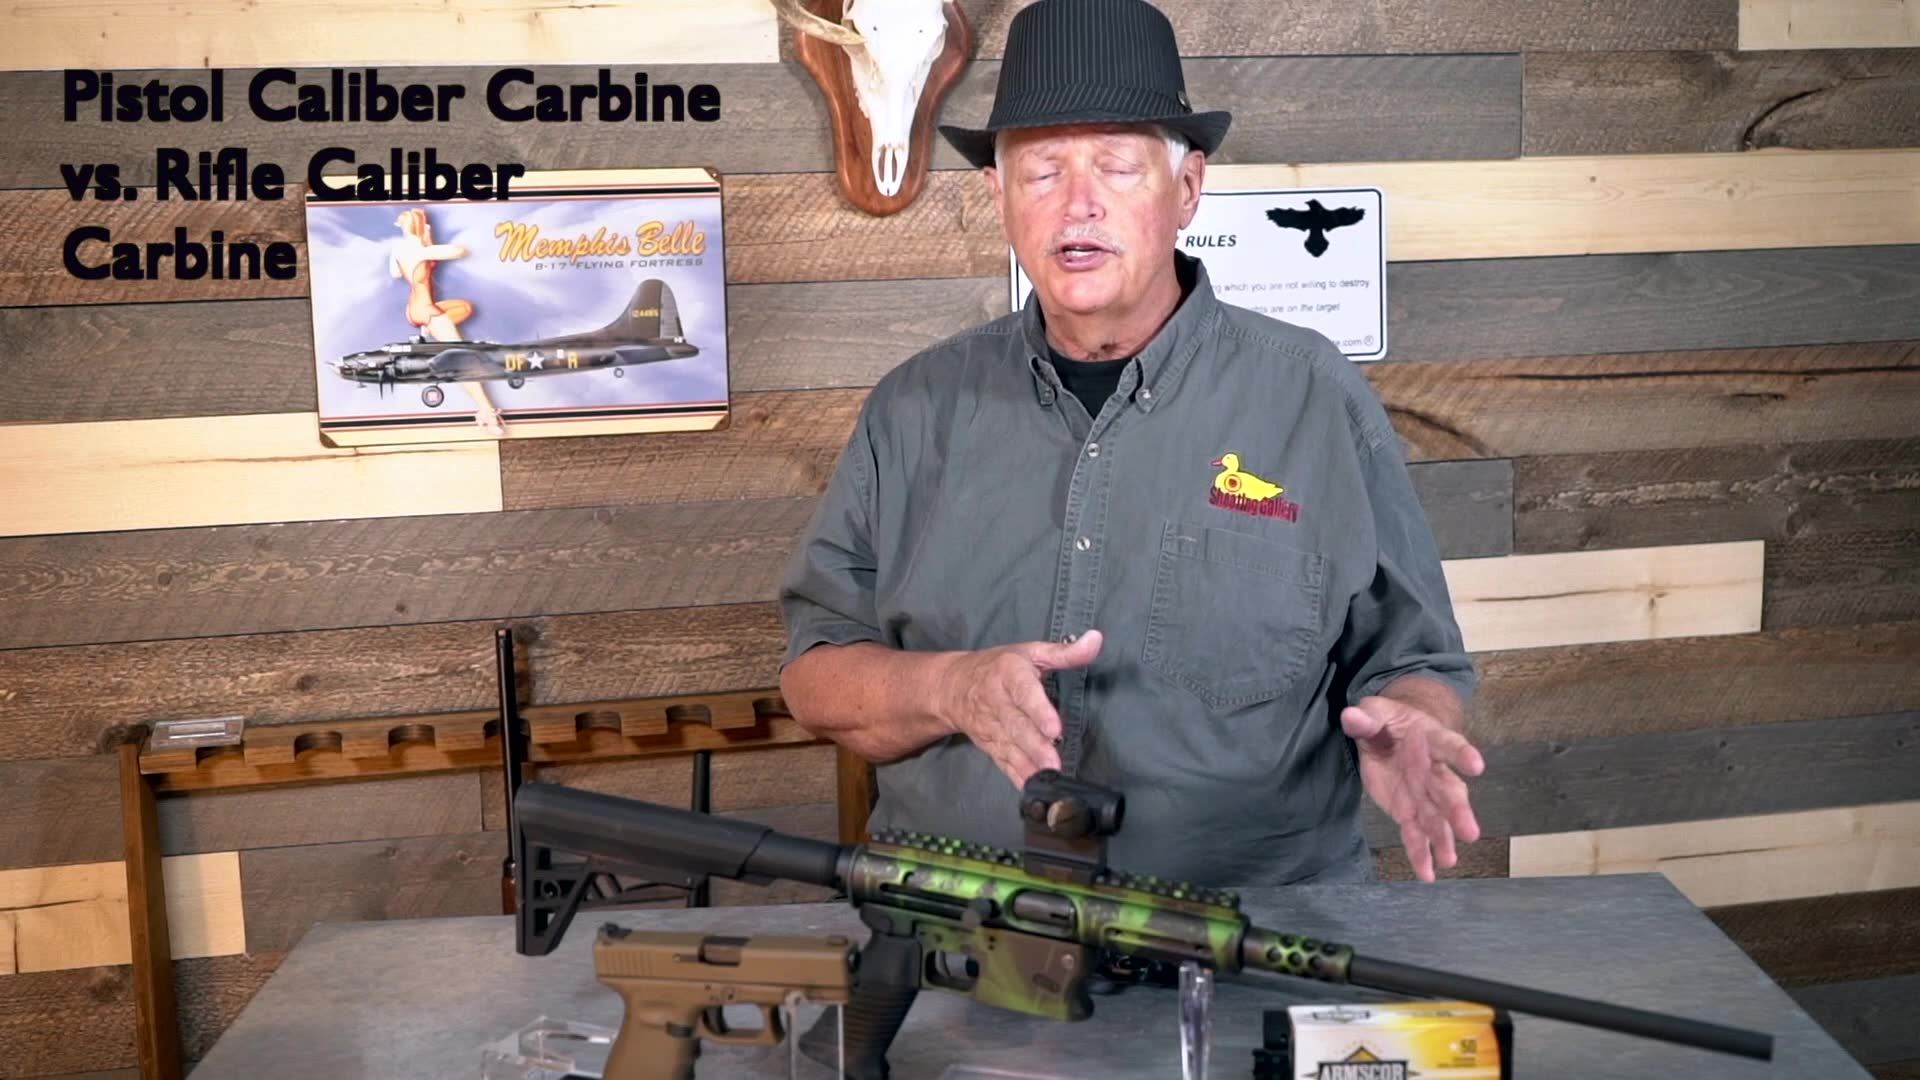 Pistol Caliber Carbines: TWN's Aero Survival Rifles